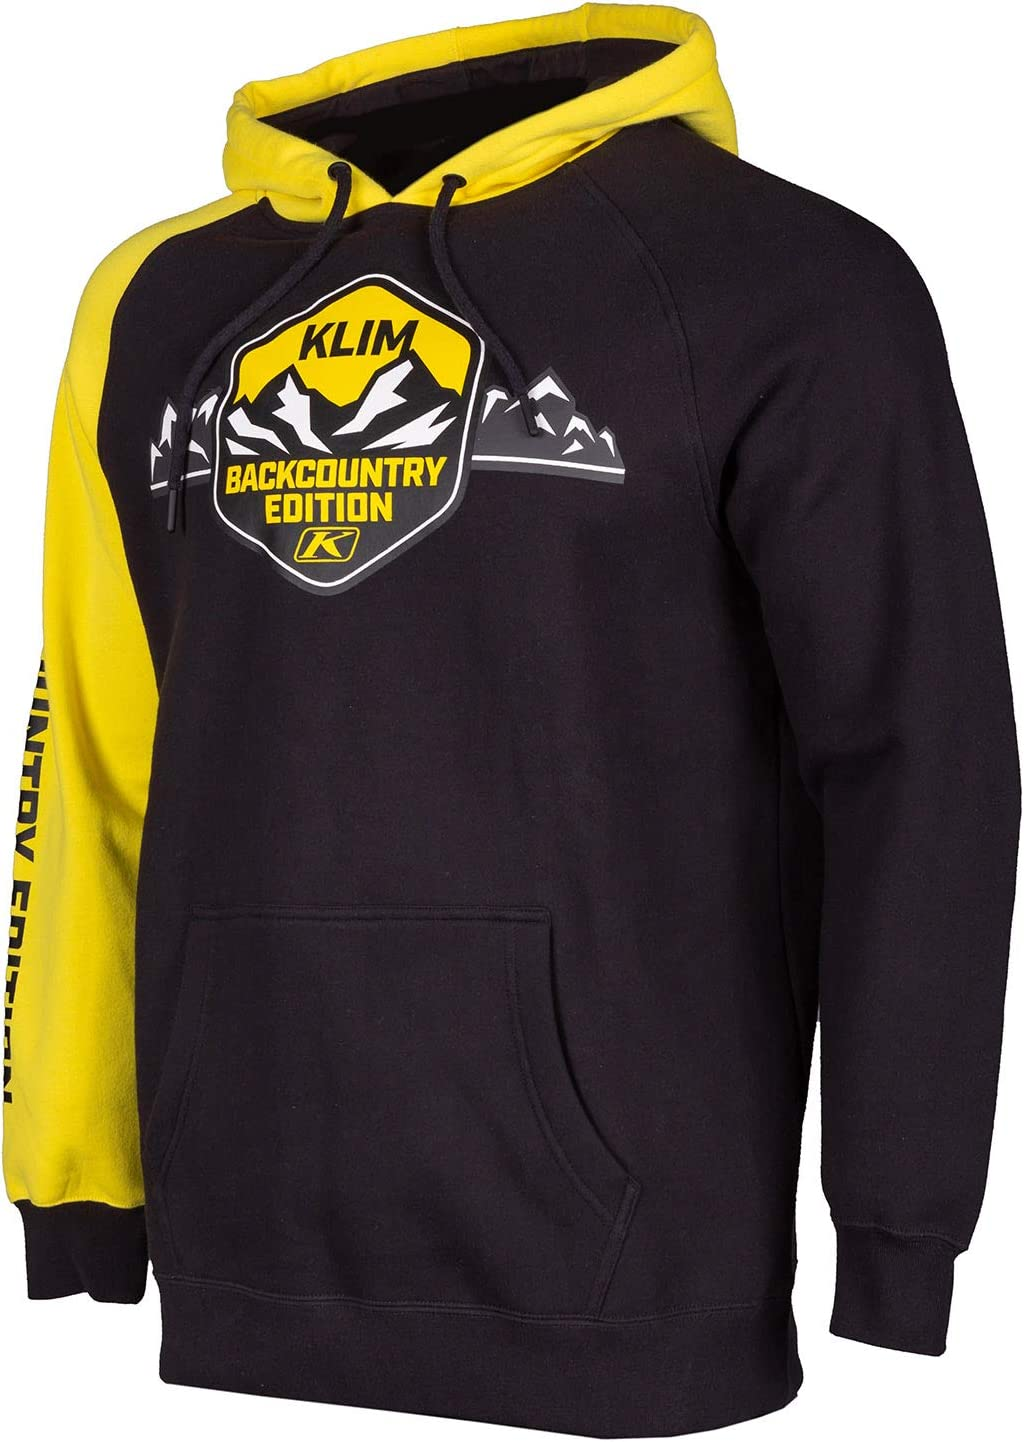 Yellow KLIM Backcountry Edition Hoodie 2X Black